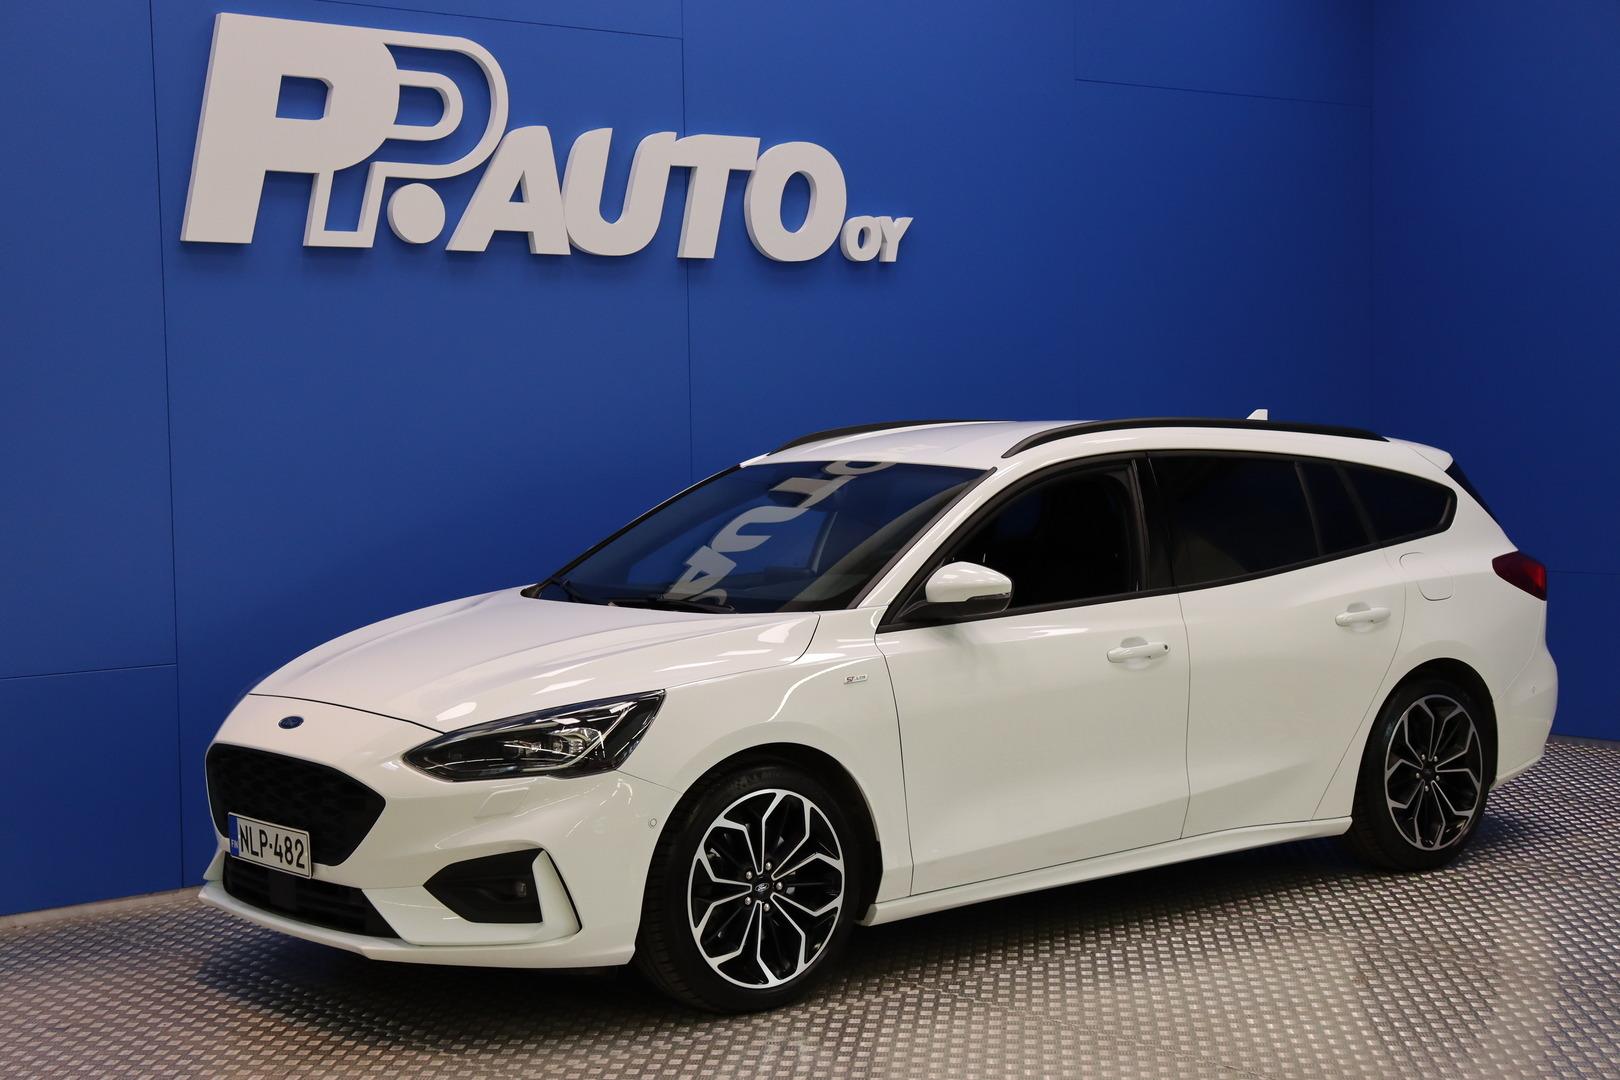 Ford Focus Huolto-Ohjelma